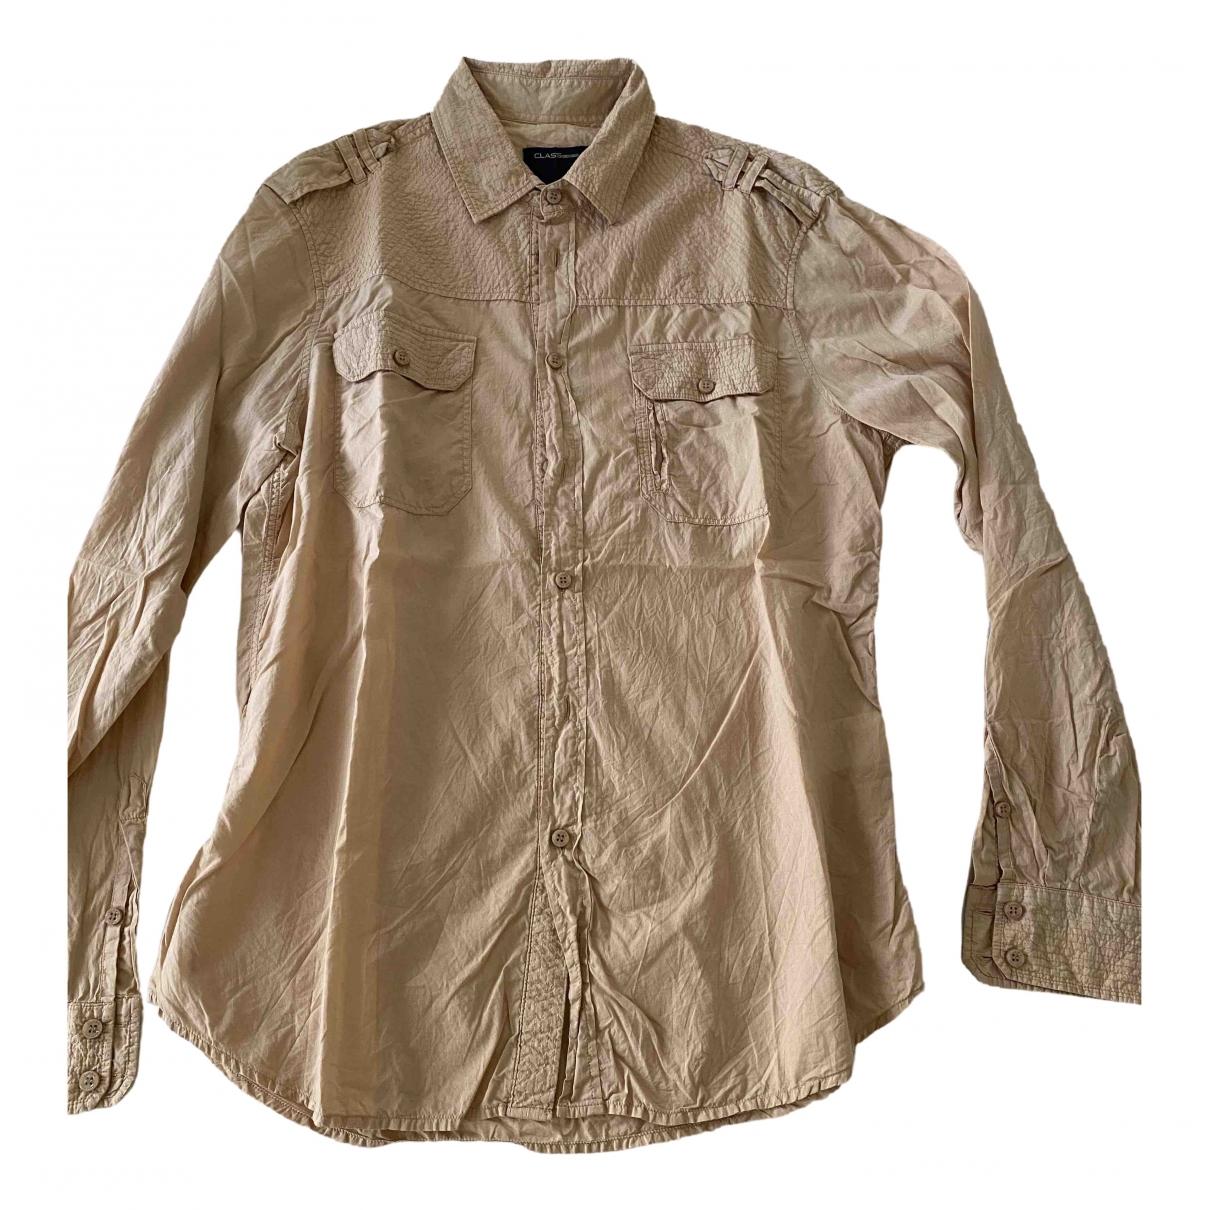 Camisas Class Cavalli